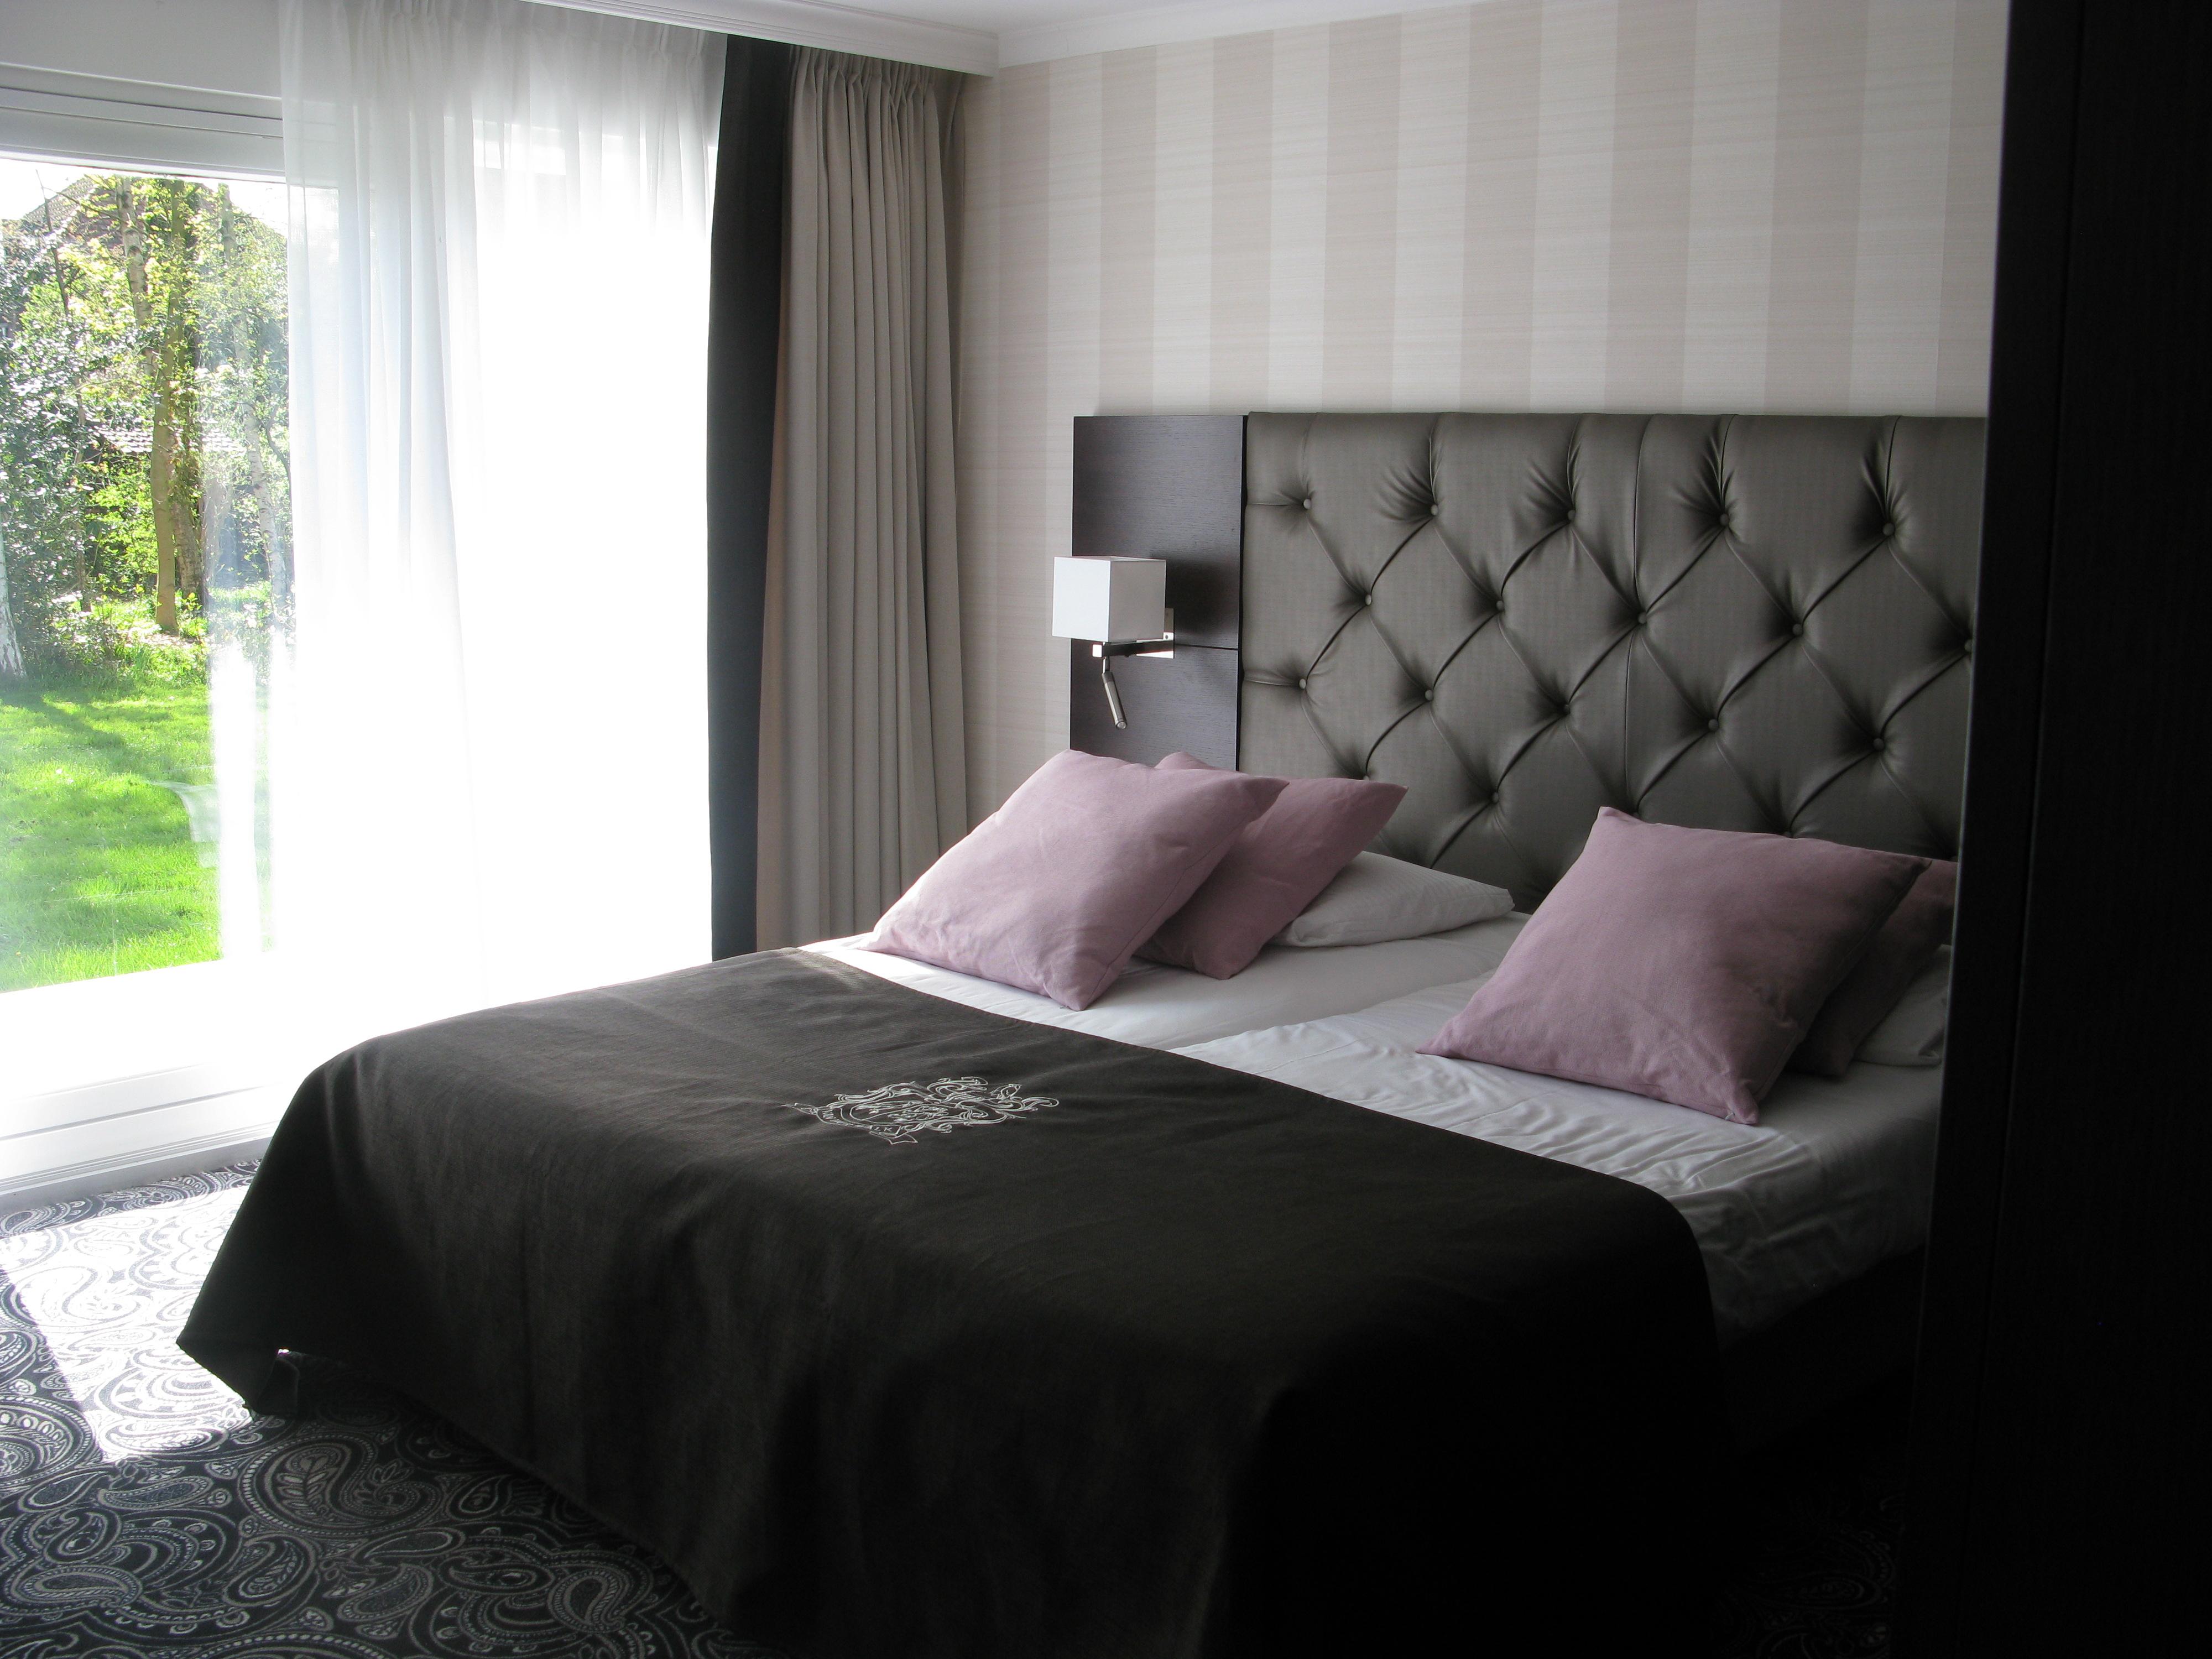 Dreibettzimmer - Hotel De Gouden Leeuw